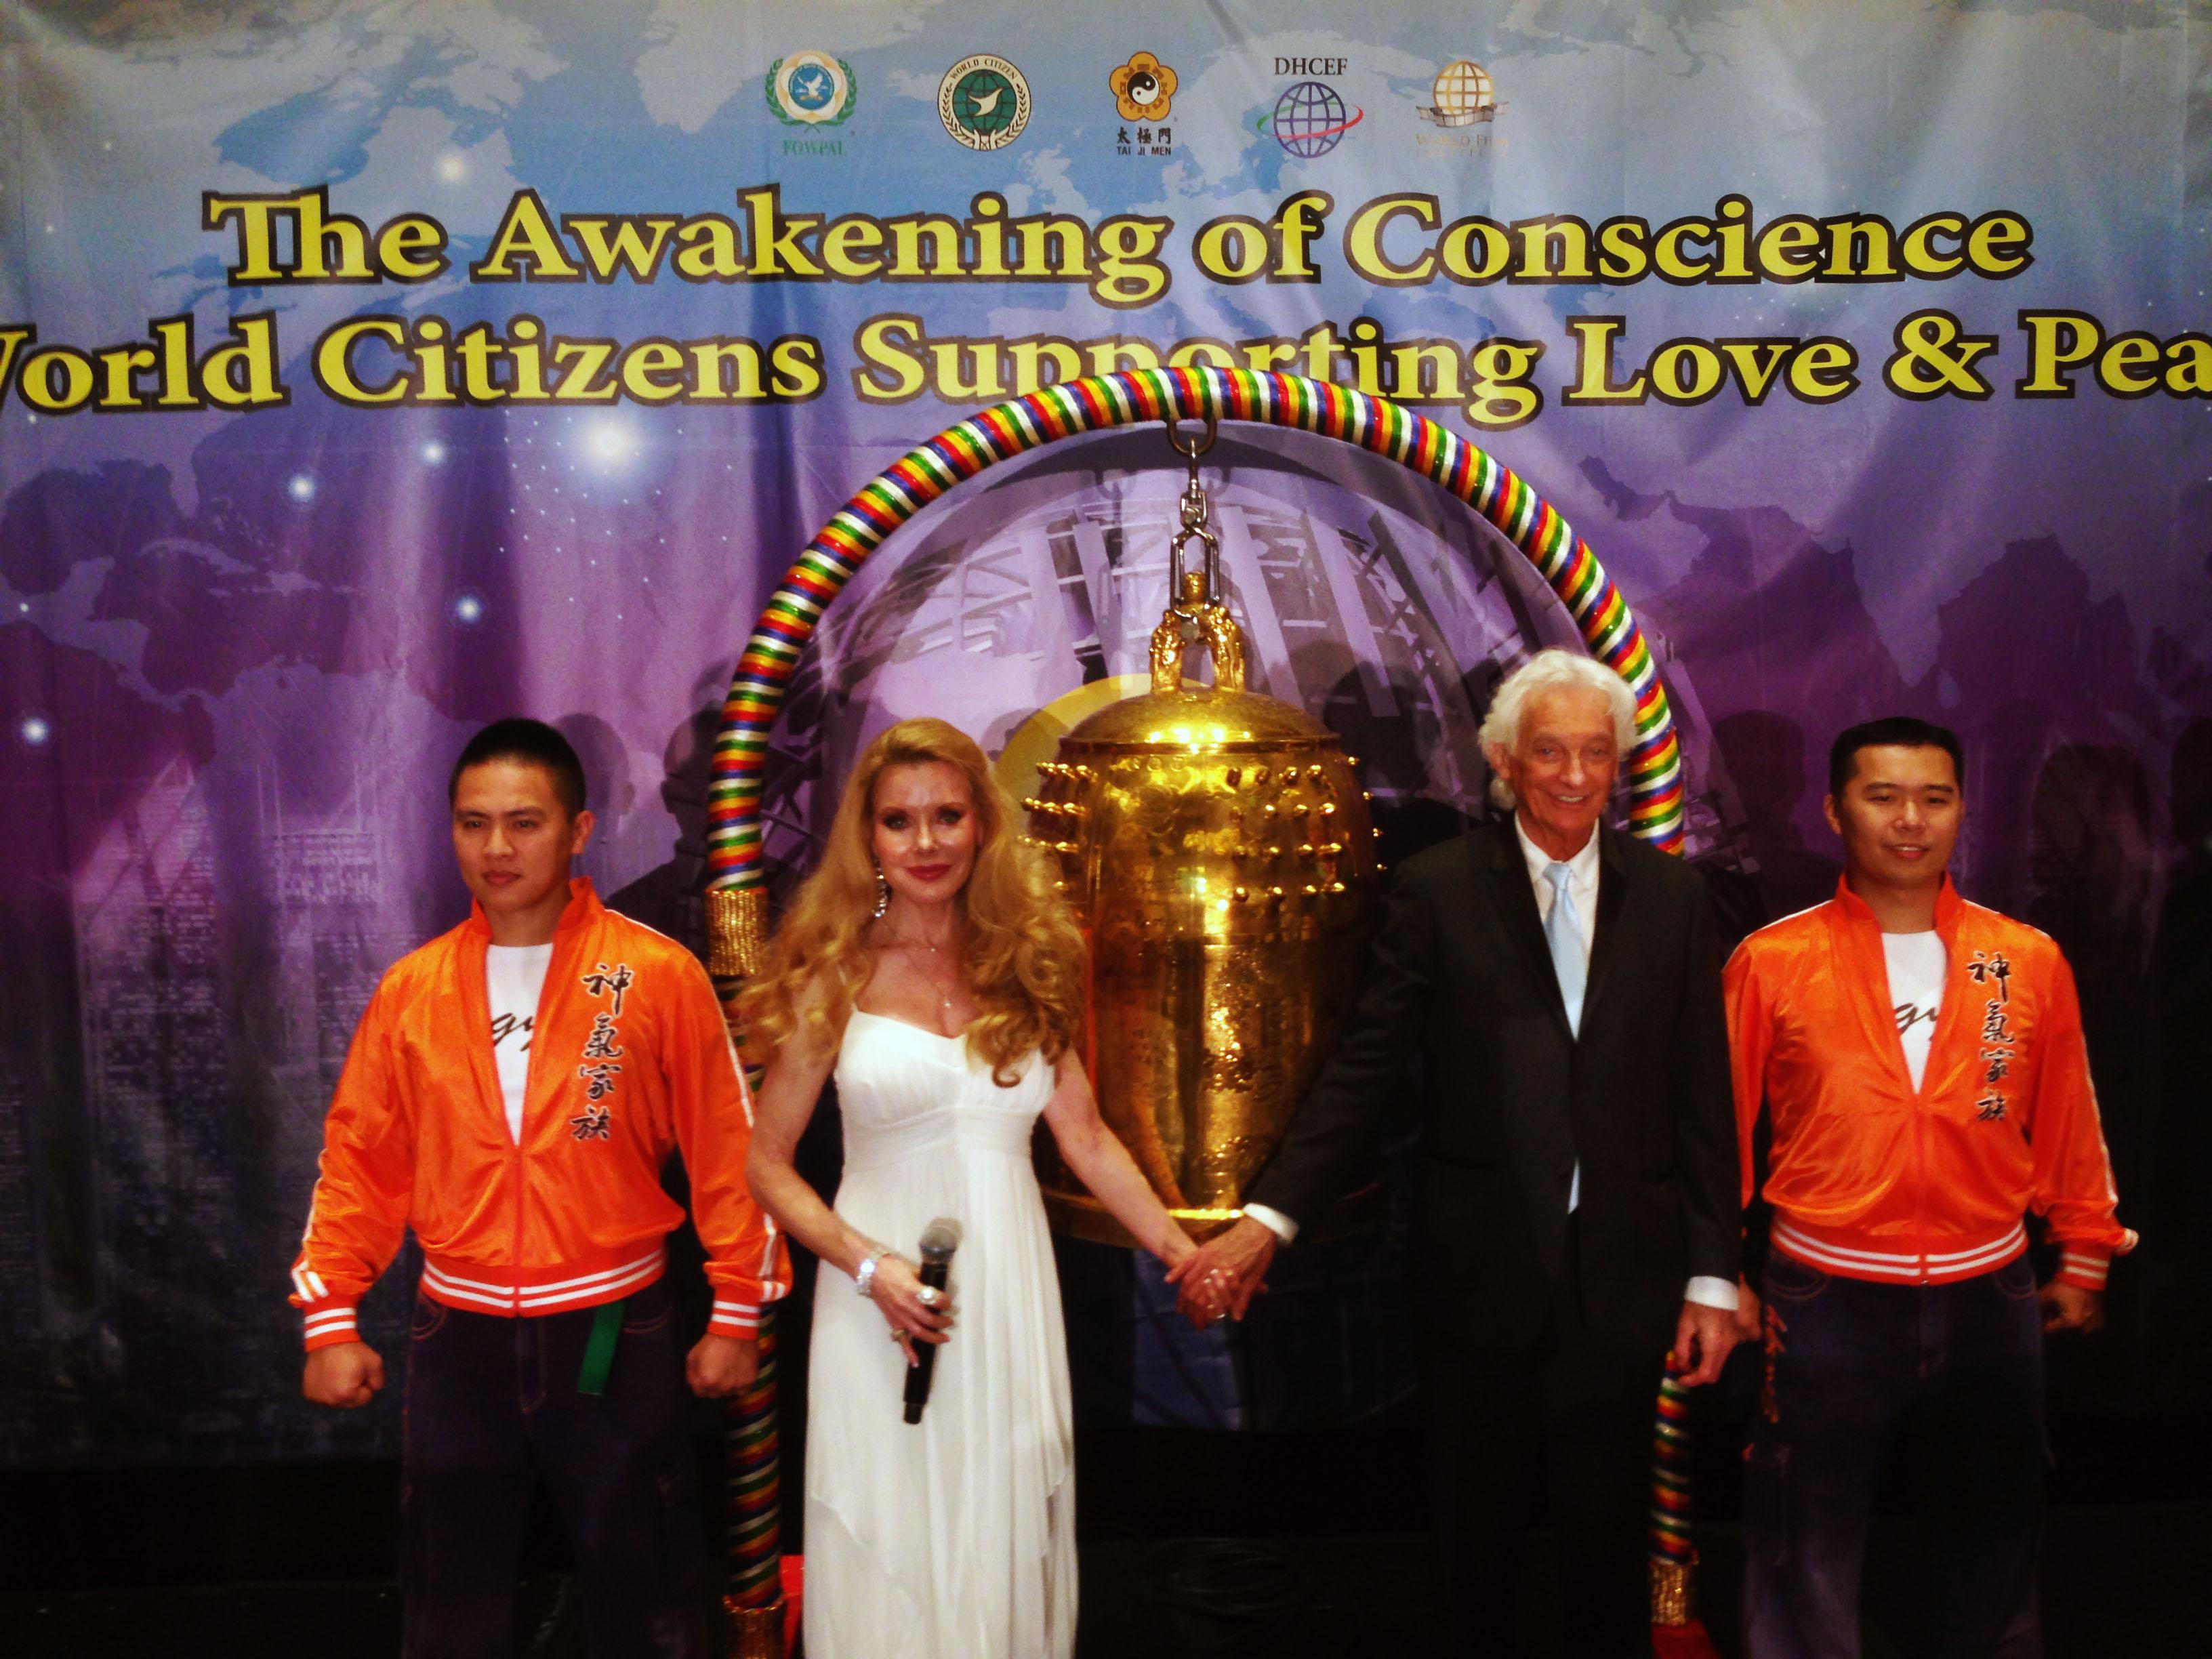 Awakening of World Conscience Conference